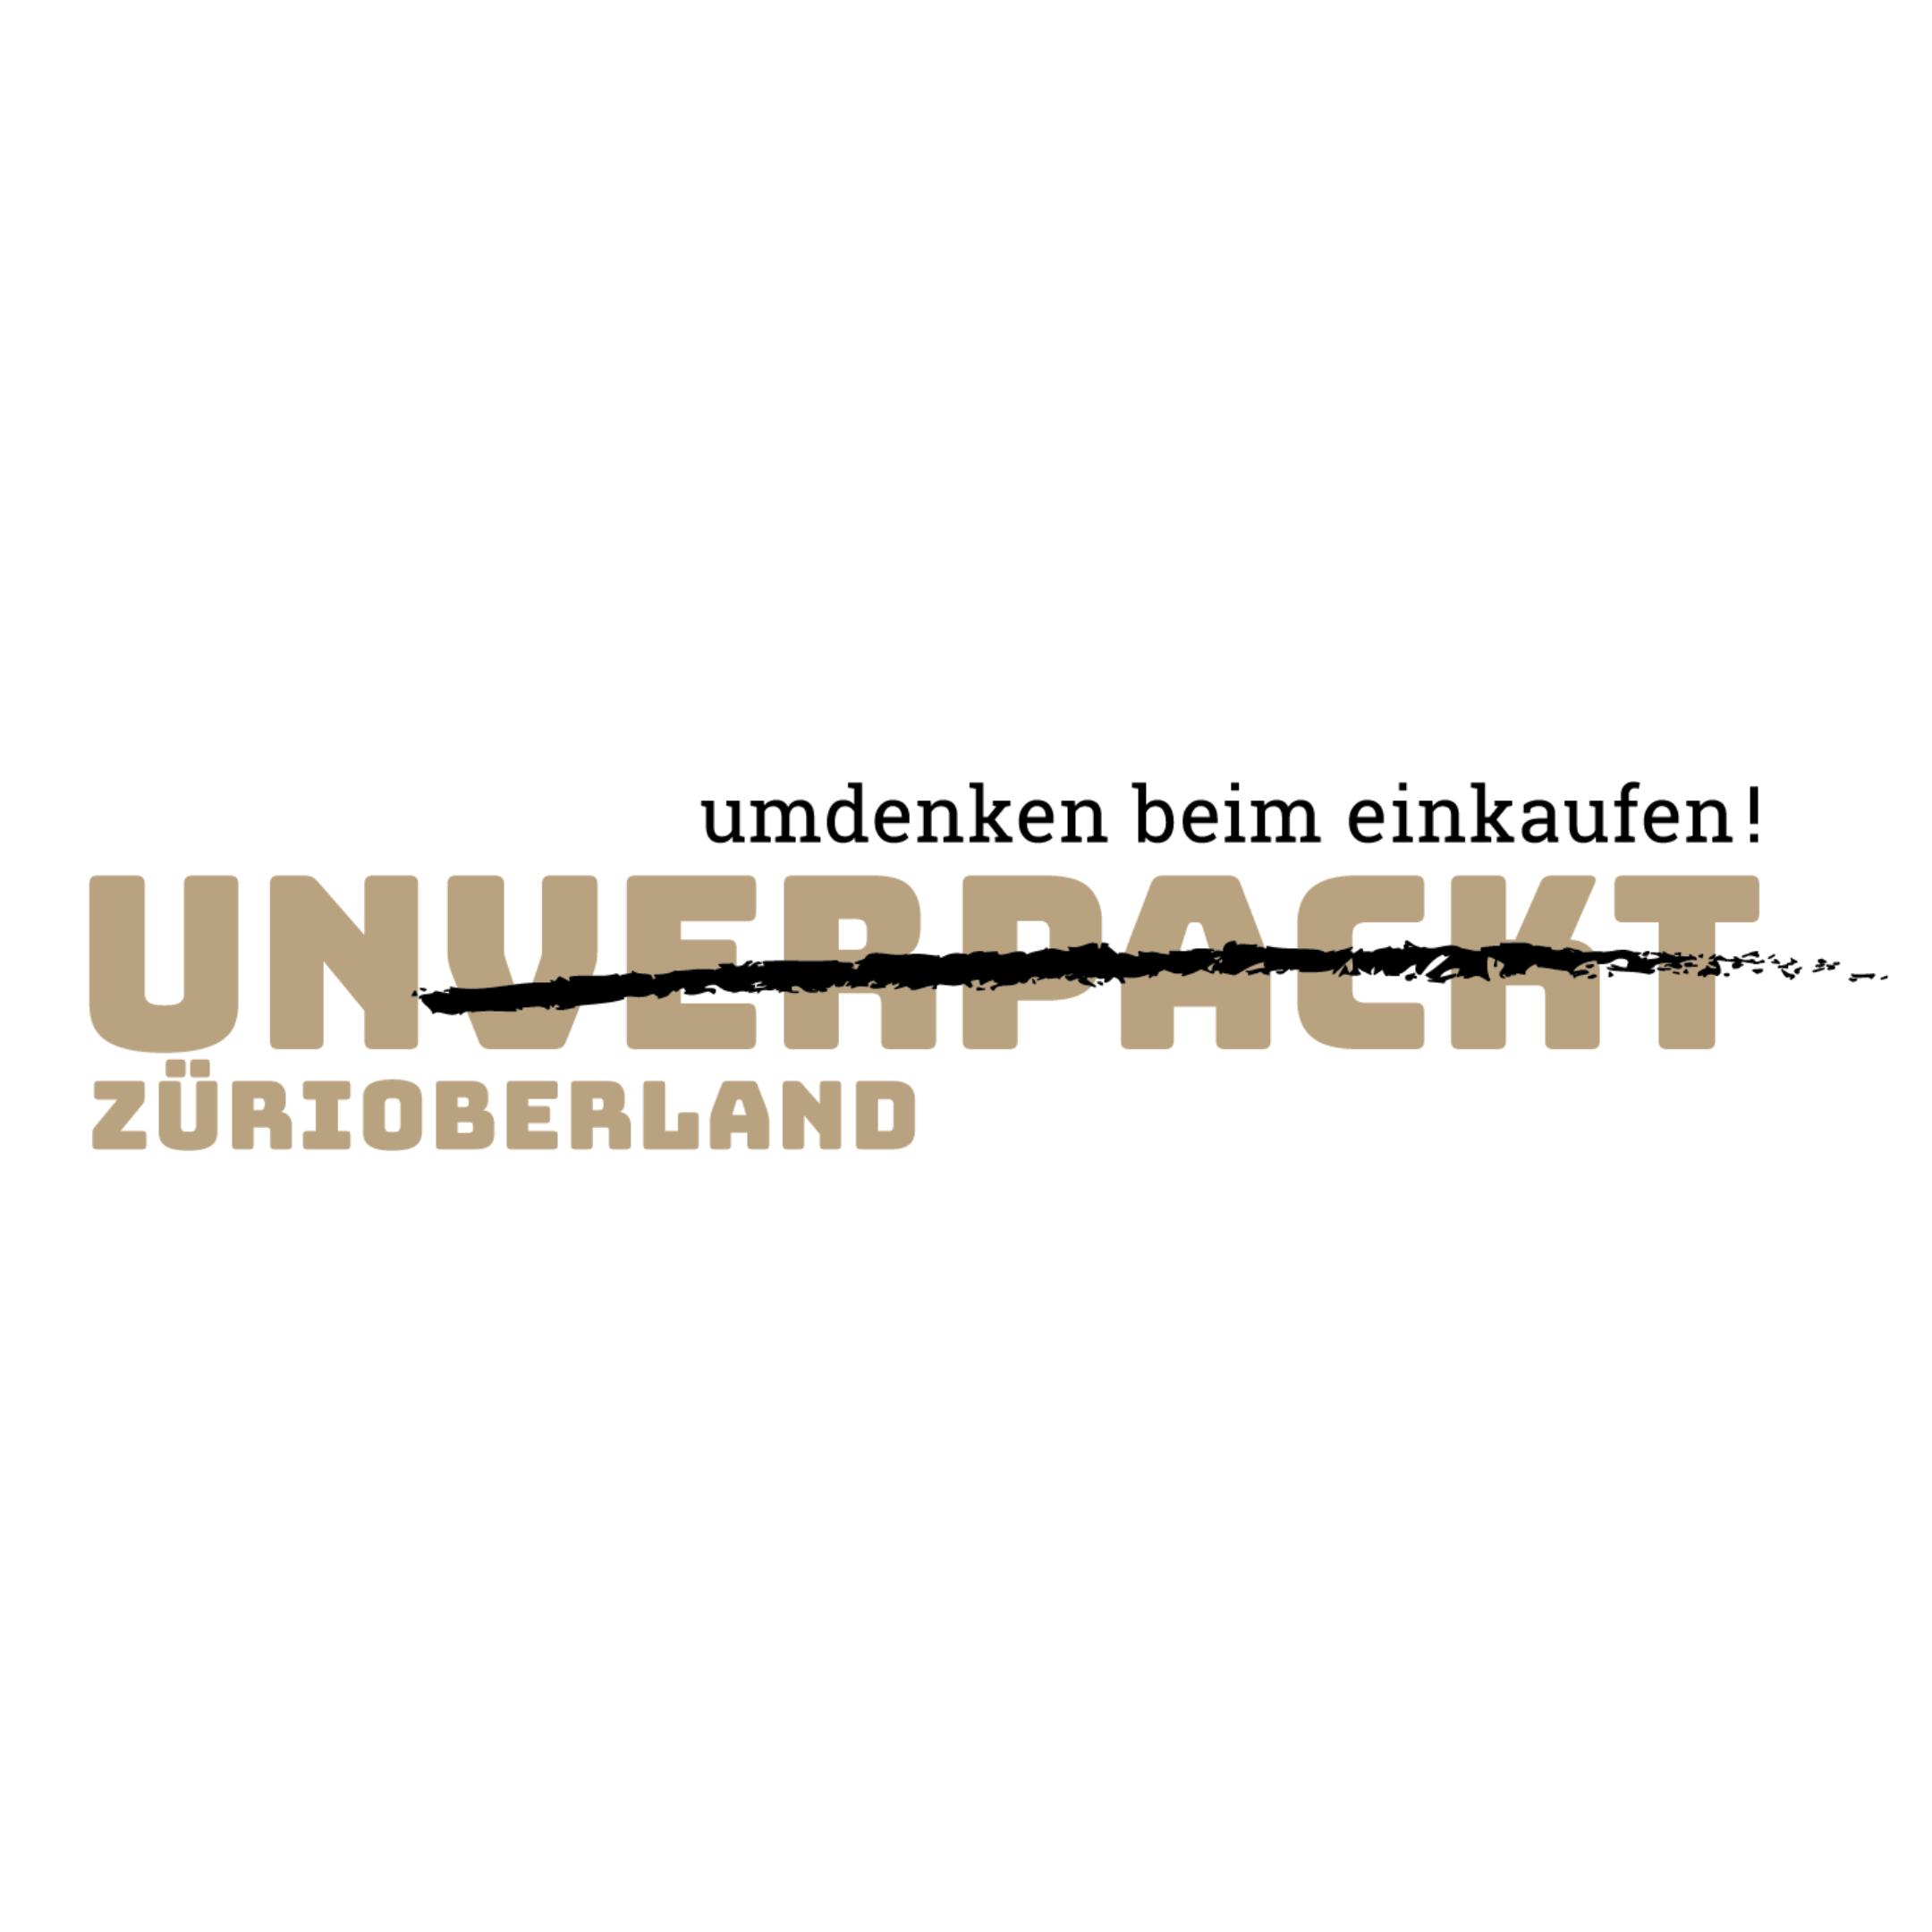 Unverpackt Zürioberland GmbH